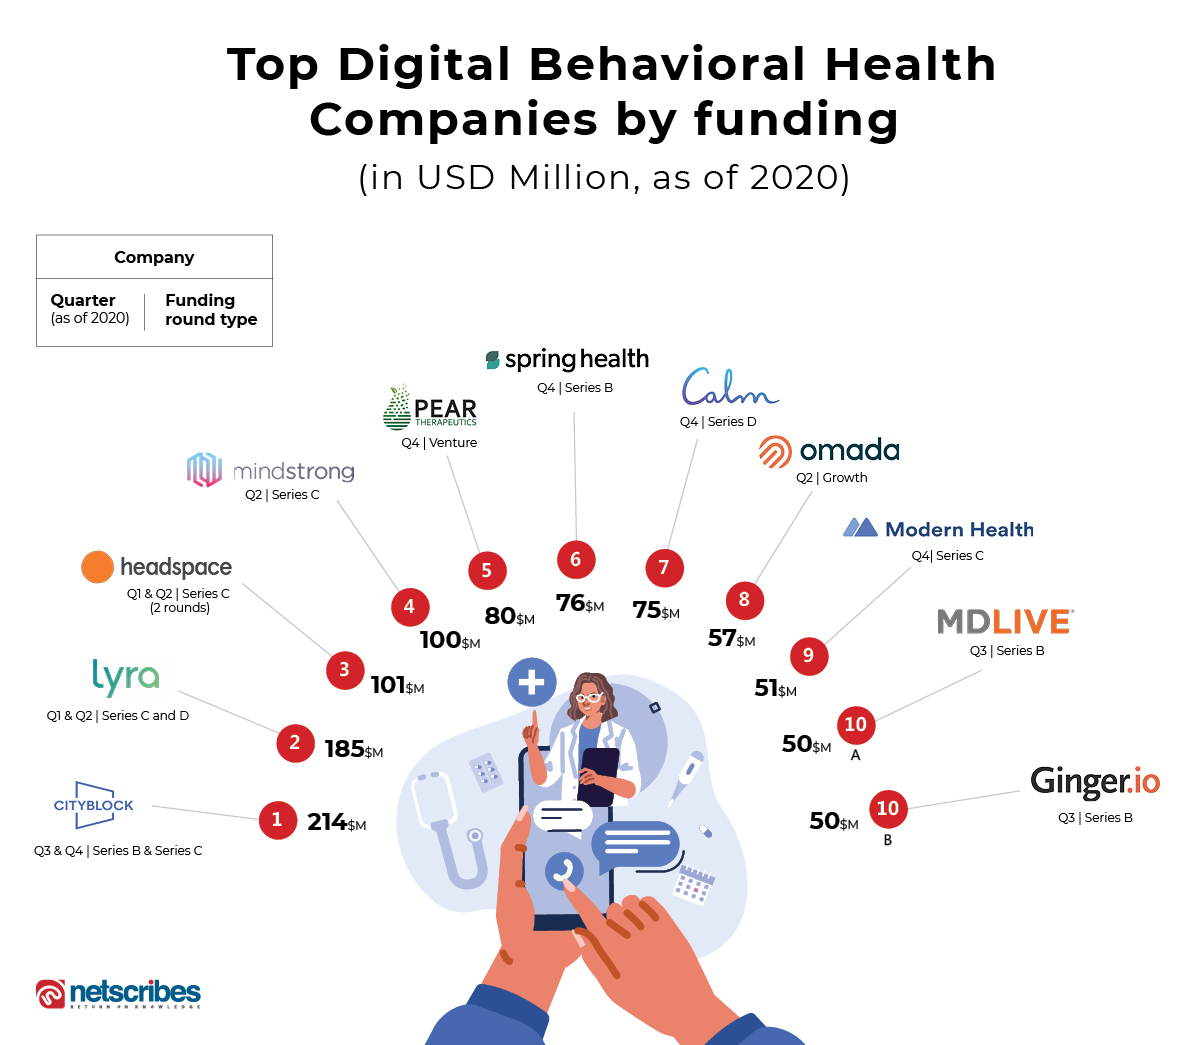 Top funded digital behavioral health companies